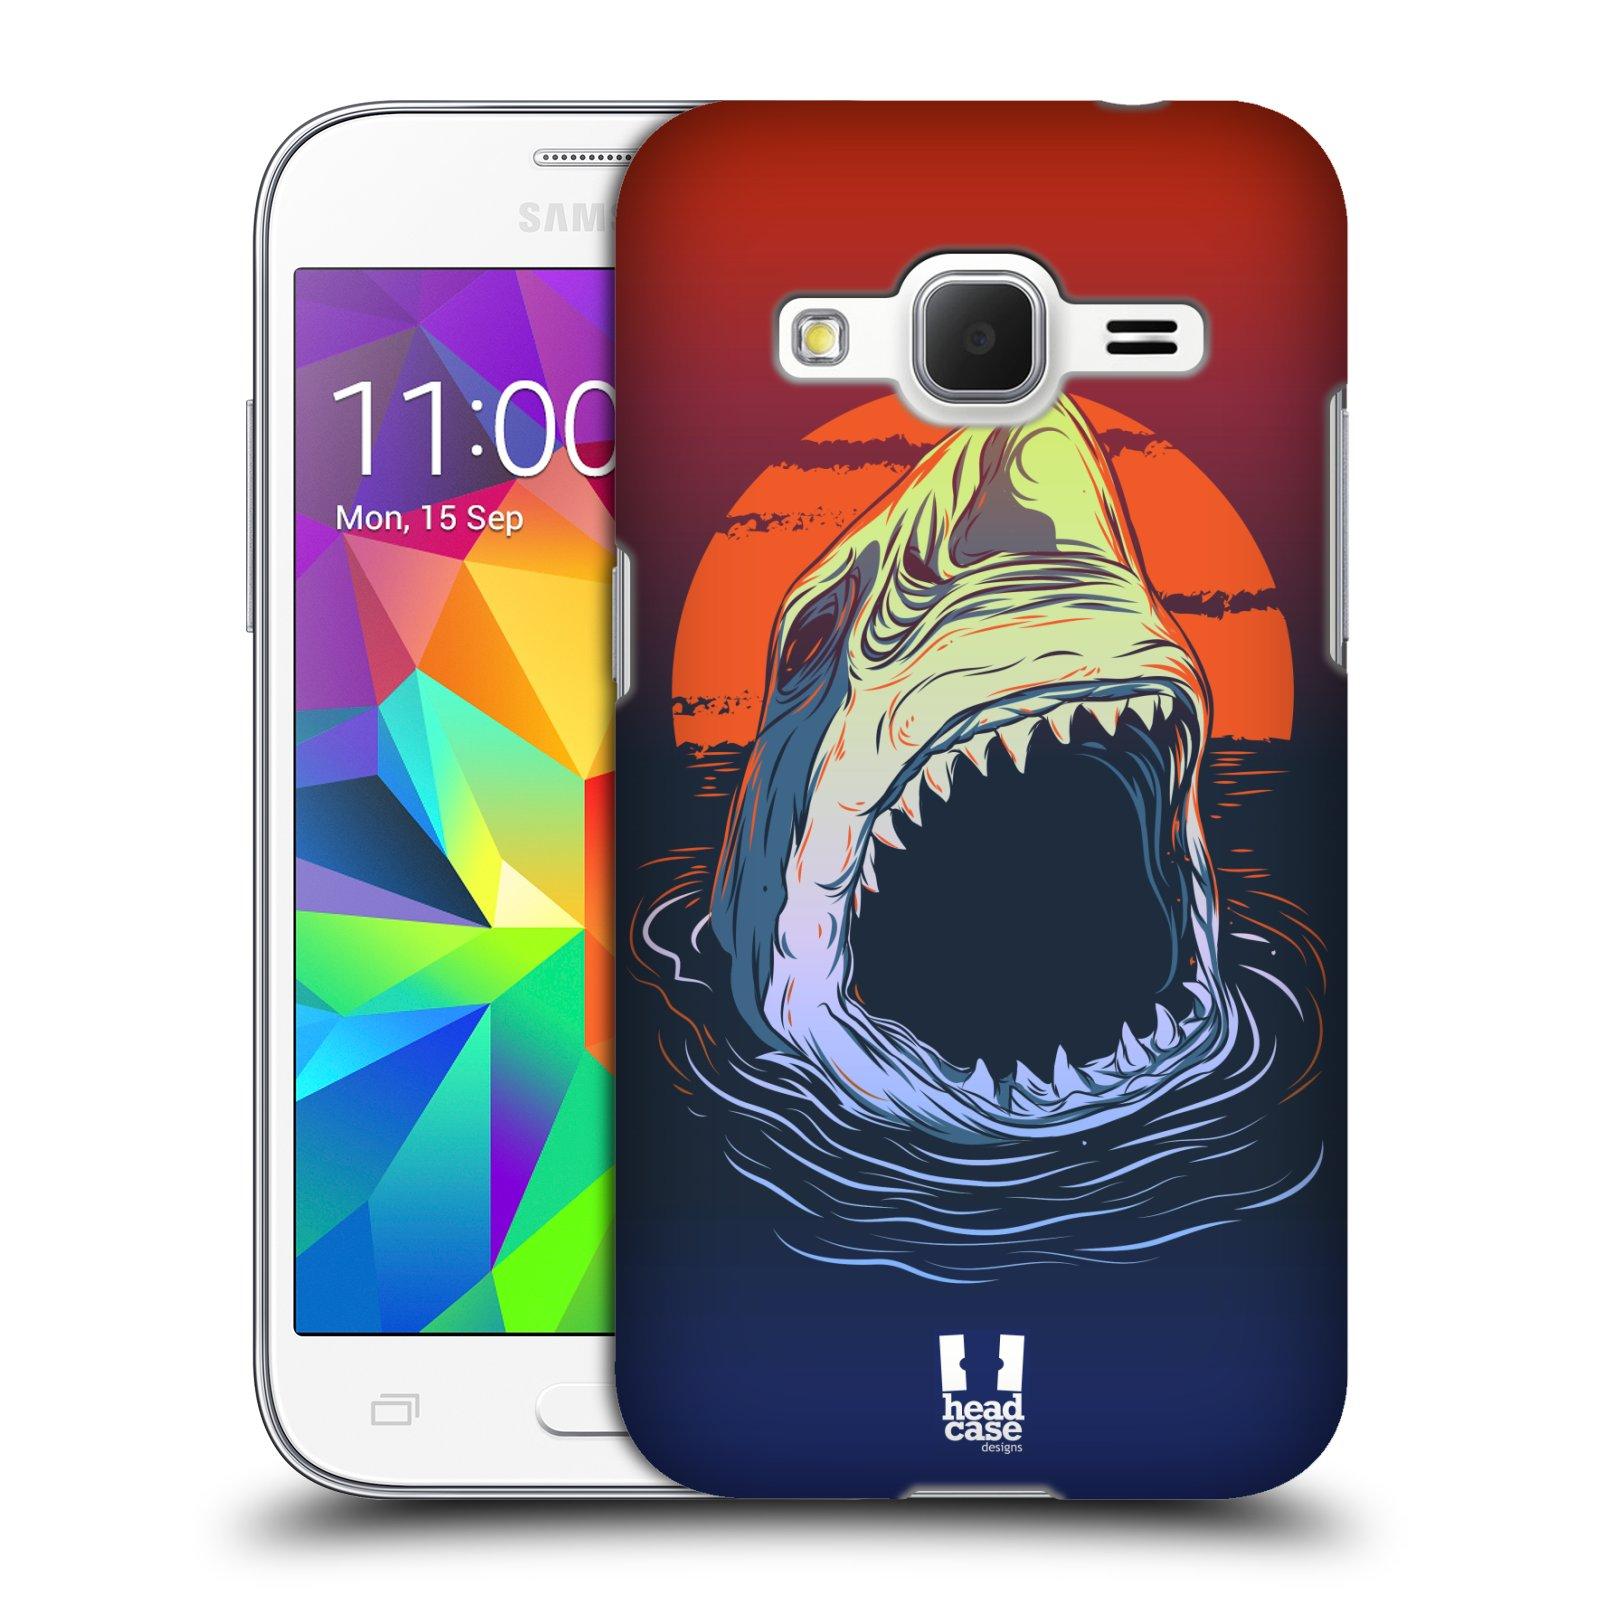 HEAD CASE plastový obal na mobil SAMSUNG GALAXY Core Prime (Core Prime VE) vzor mořská monstra žralok